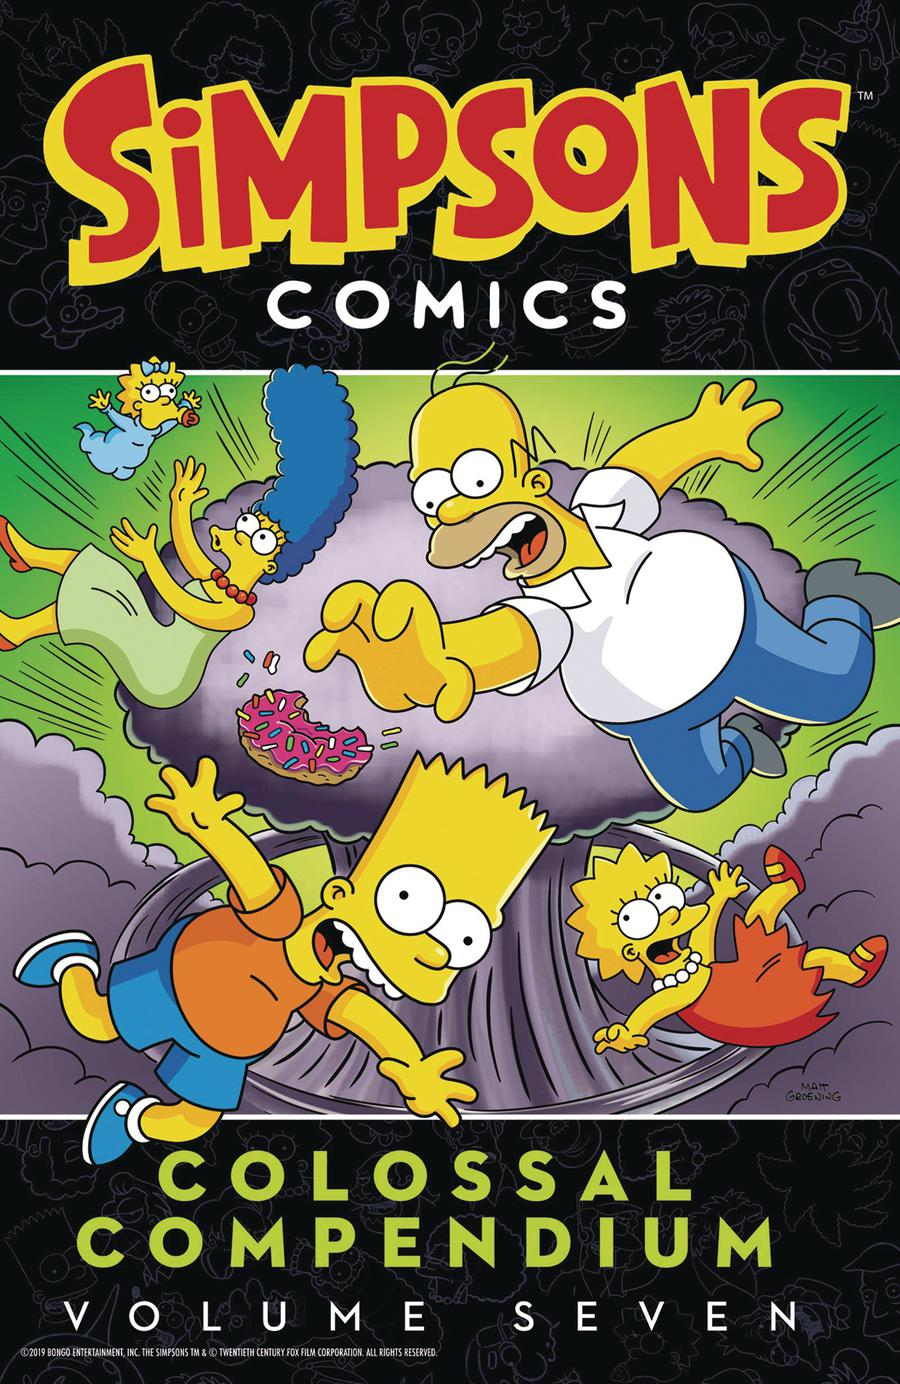 Simpsons Comics Colossal Compendium Vol 7 TP